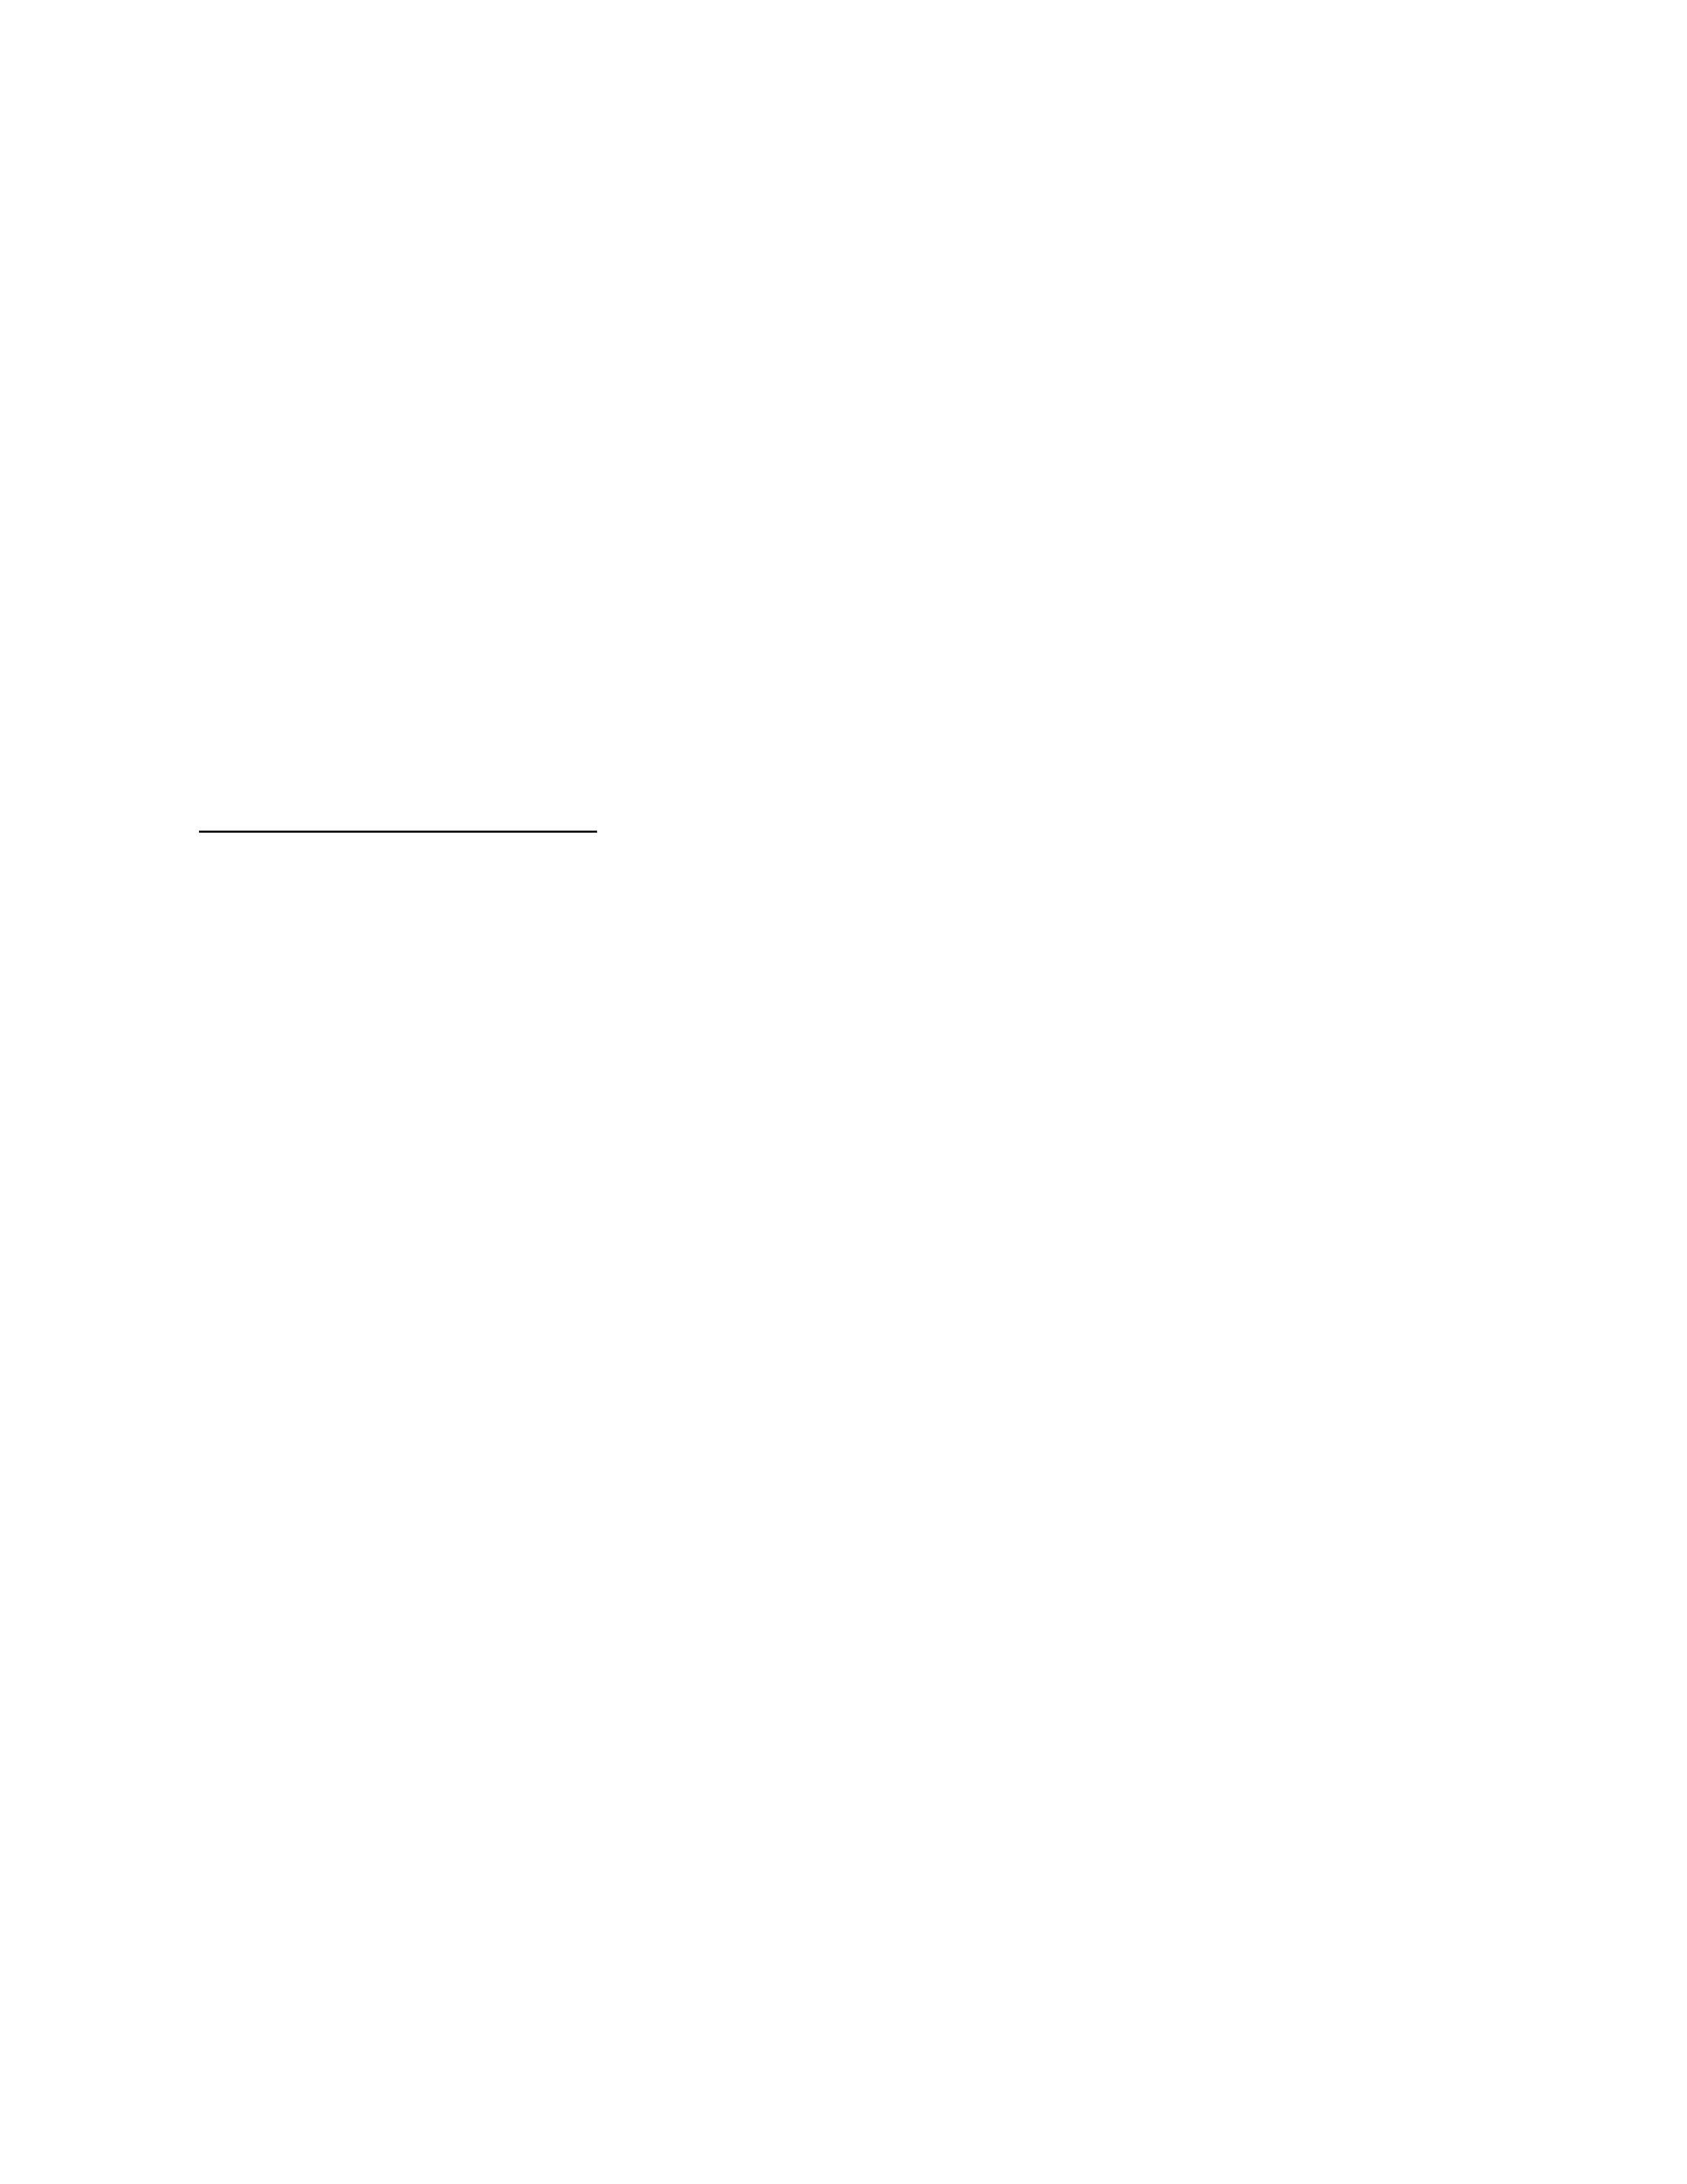 SSL_BTM_Exhibit_.pdf_49